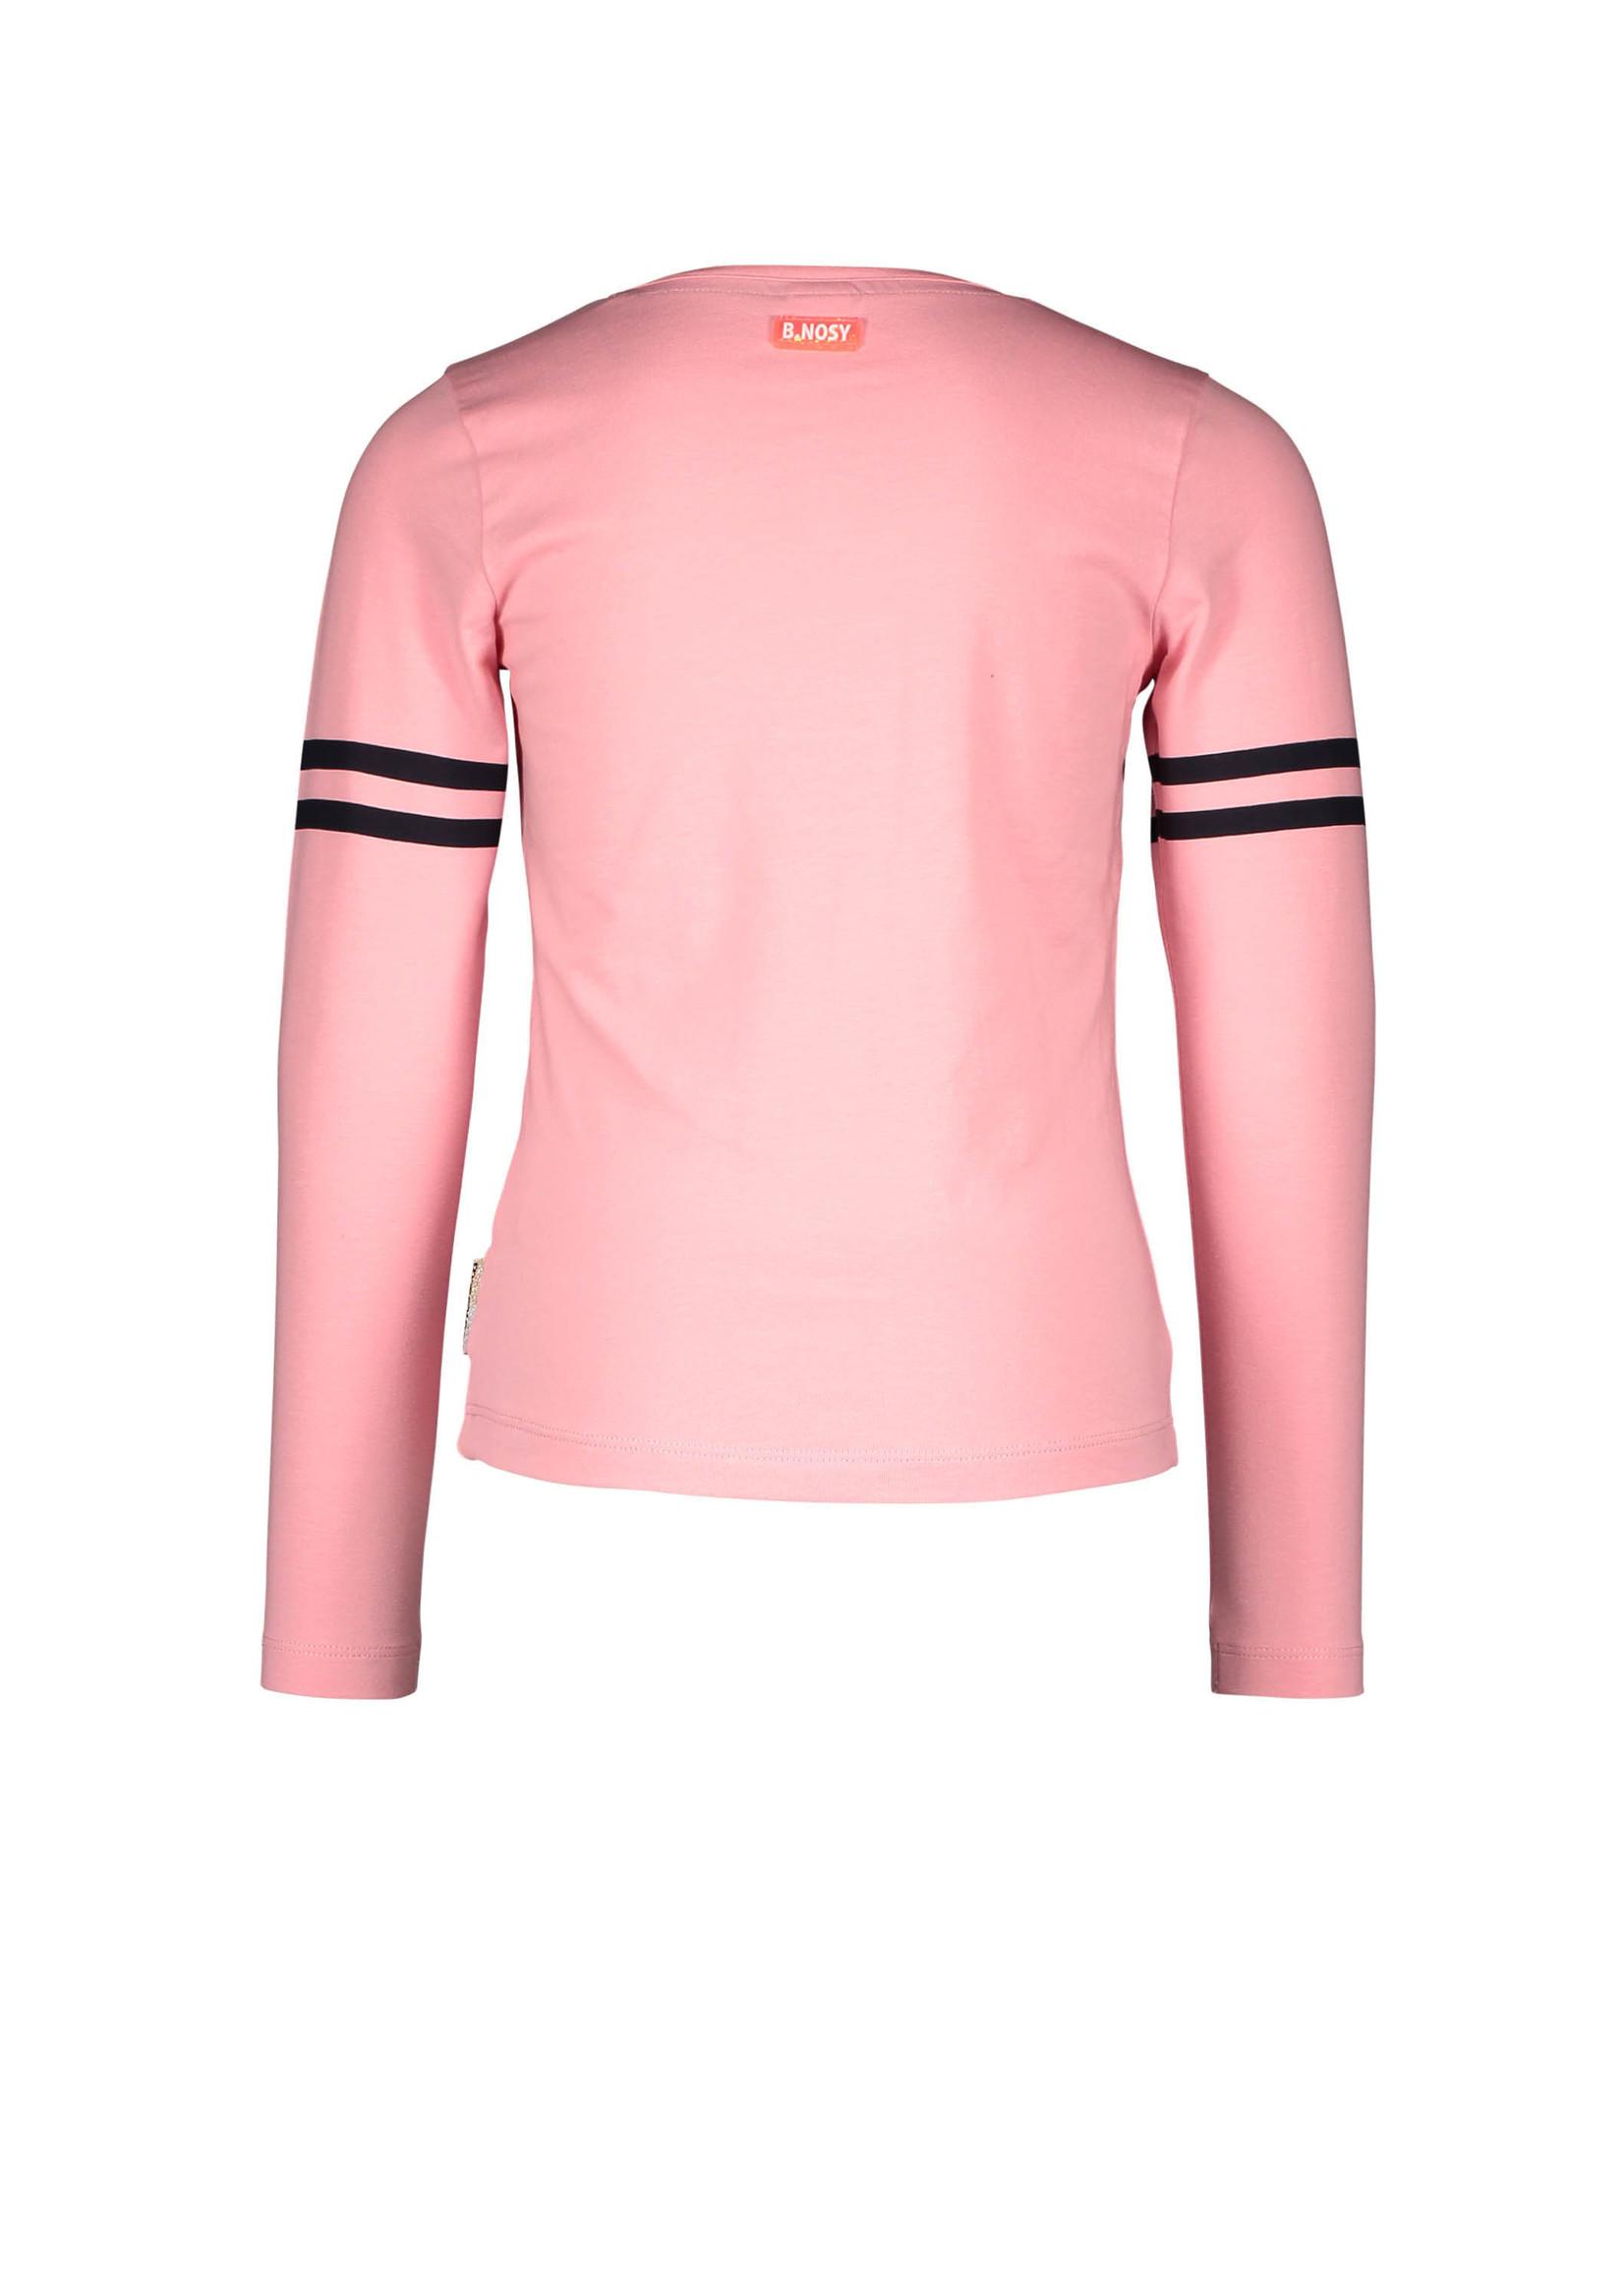 B.nosy Longsleeve Punch Pink